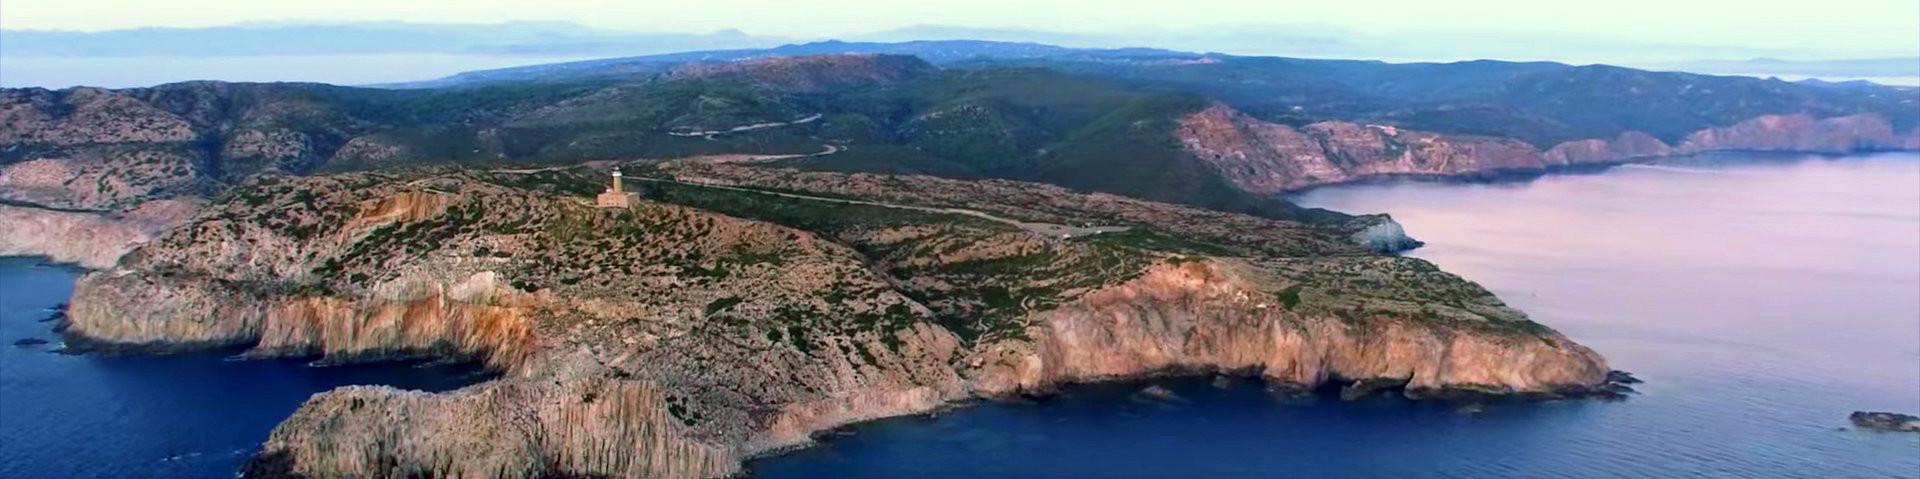 ostrov San Pietro